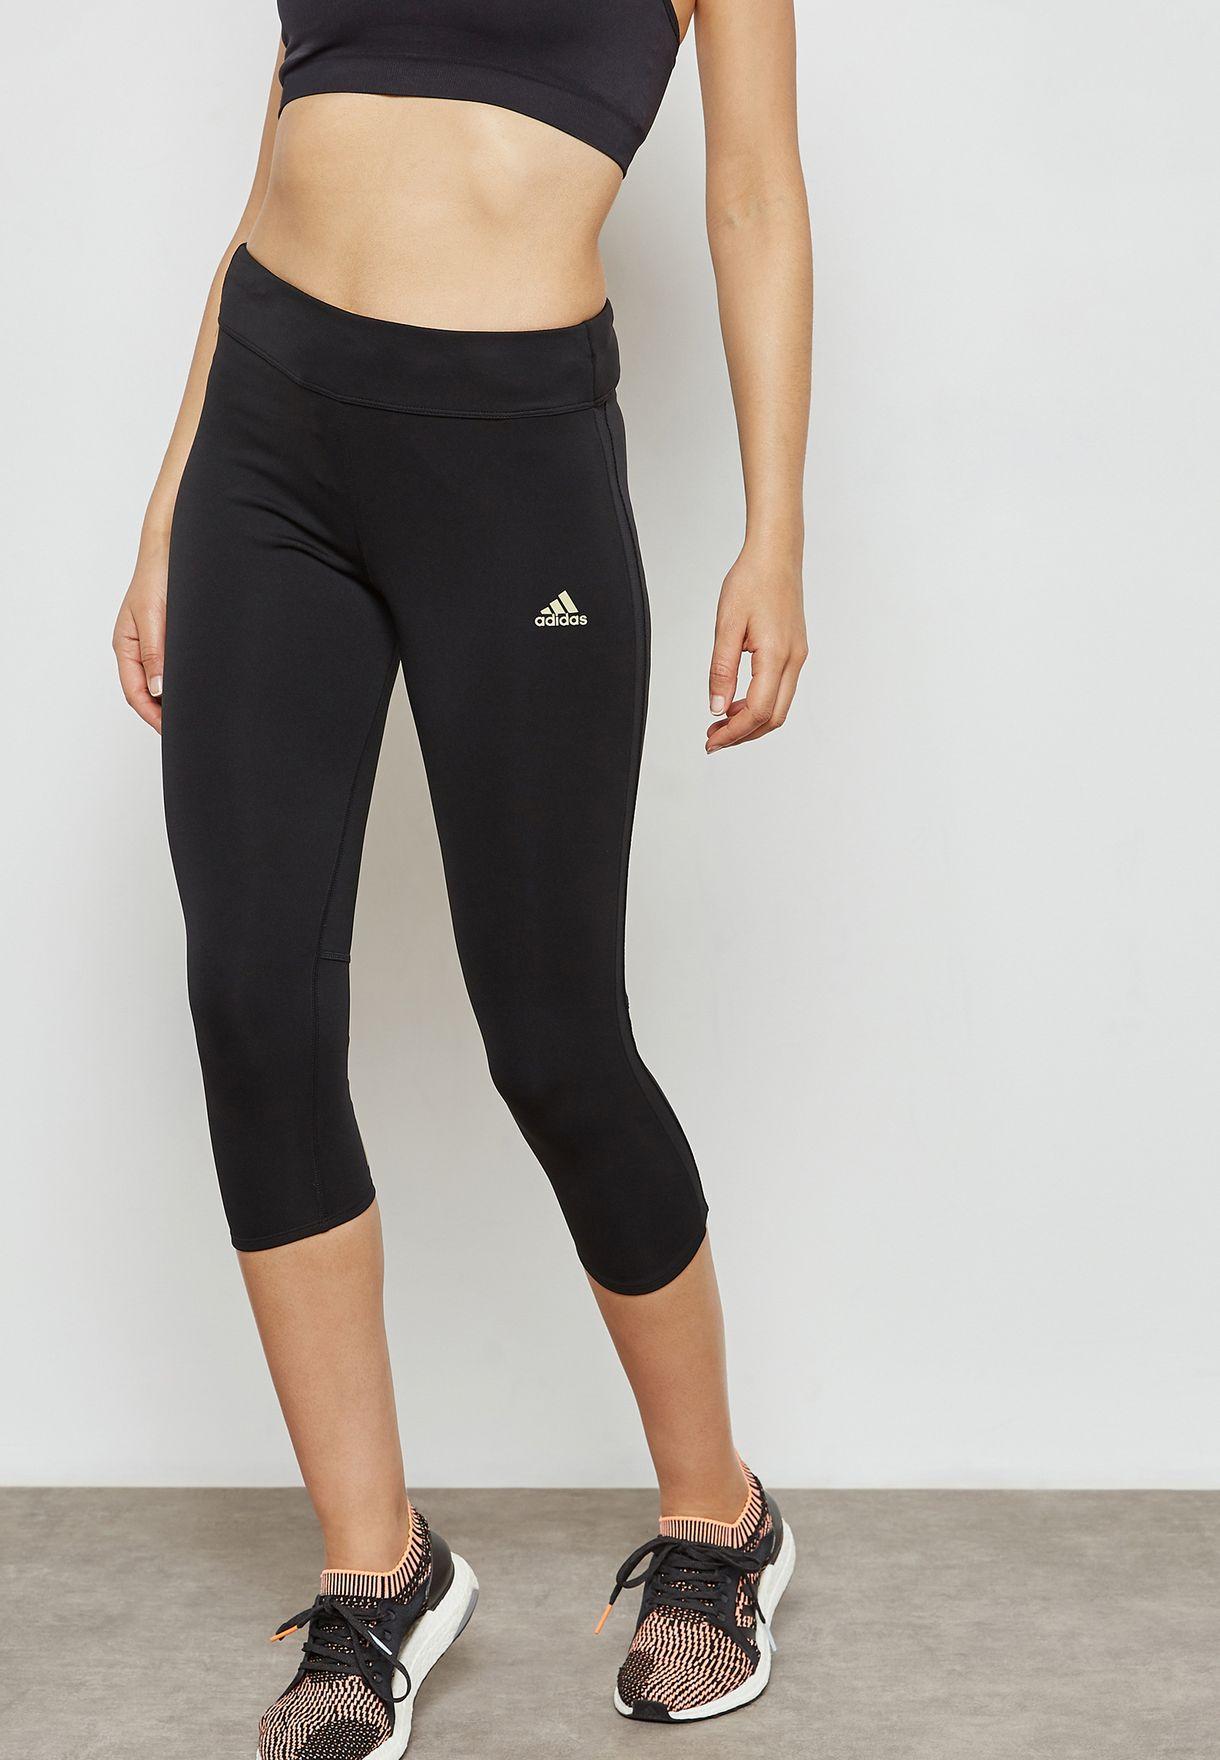 57002347c26 Shop adidas black Response 3/4 Leggings CF6221 for Women in UAE -  AD476AT24NBR